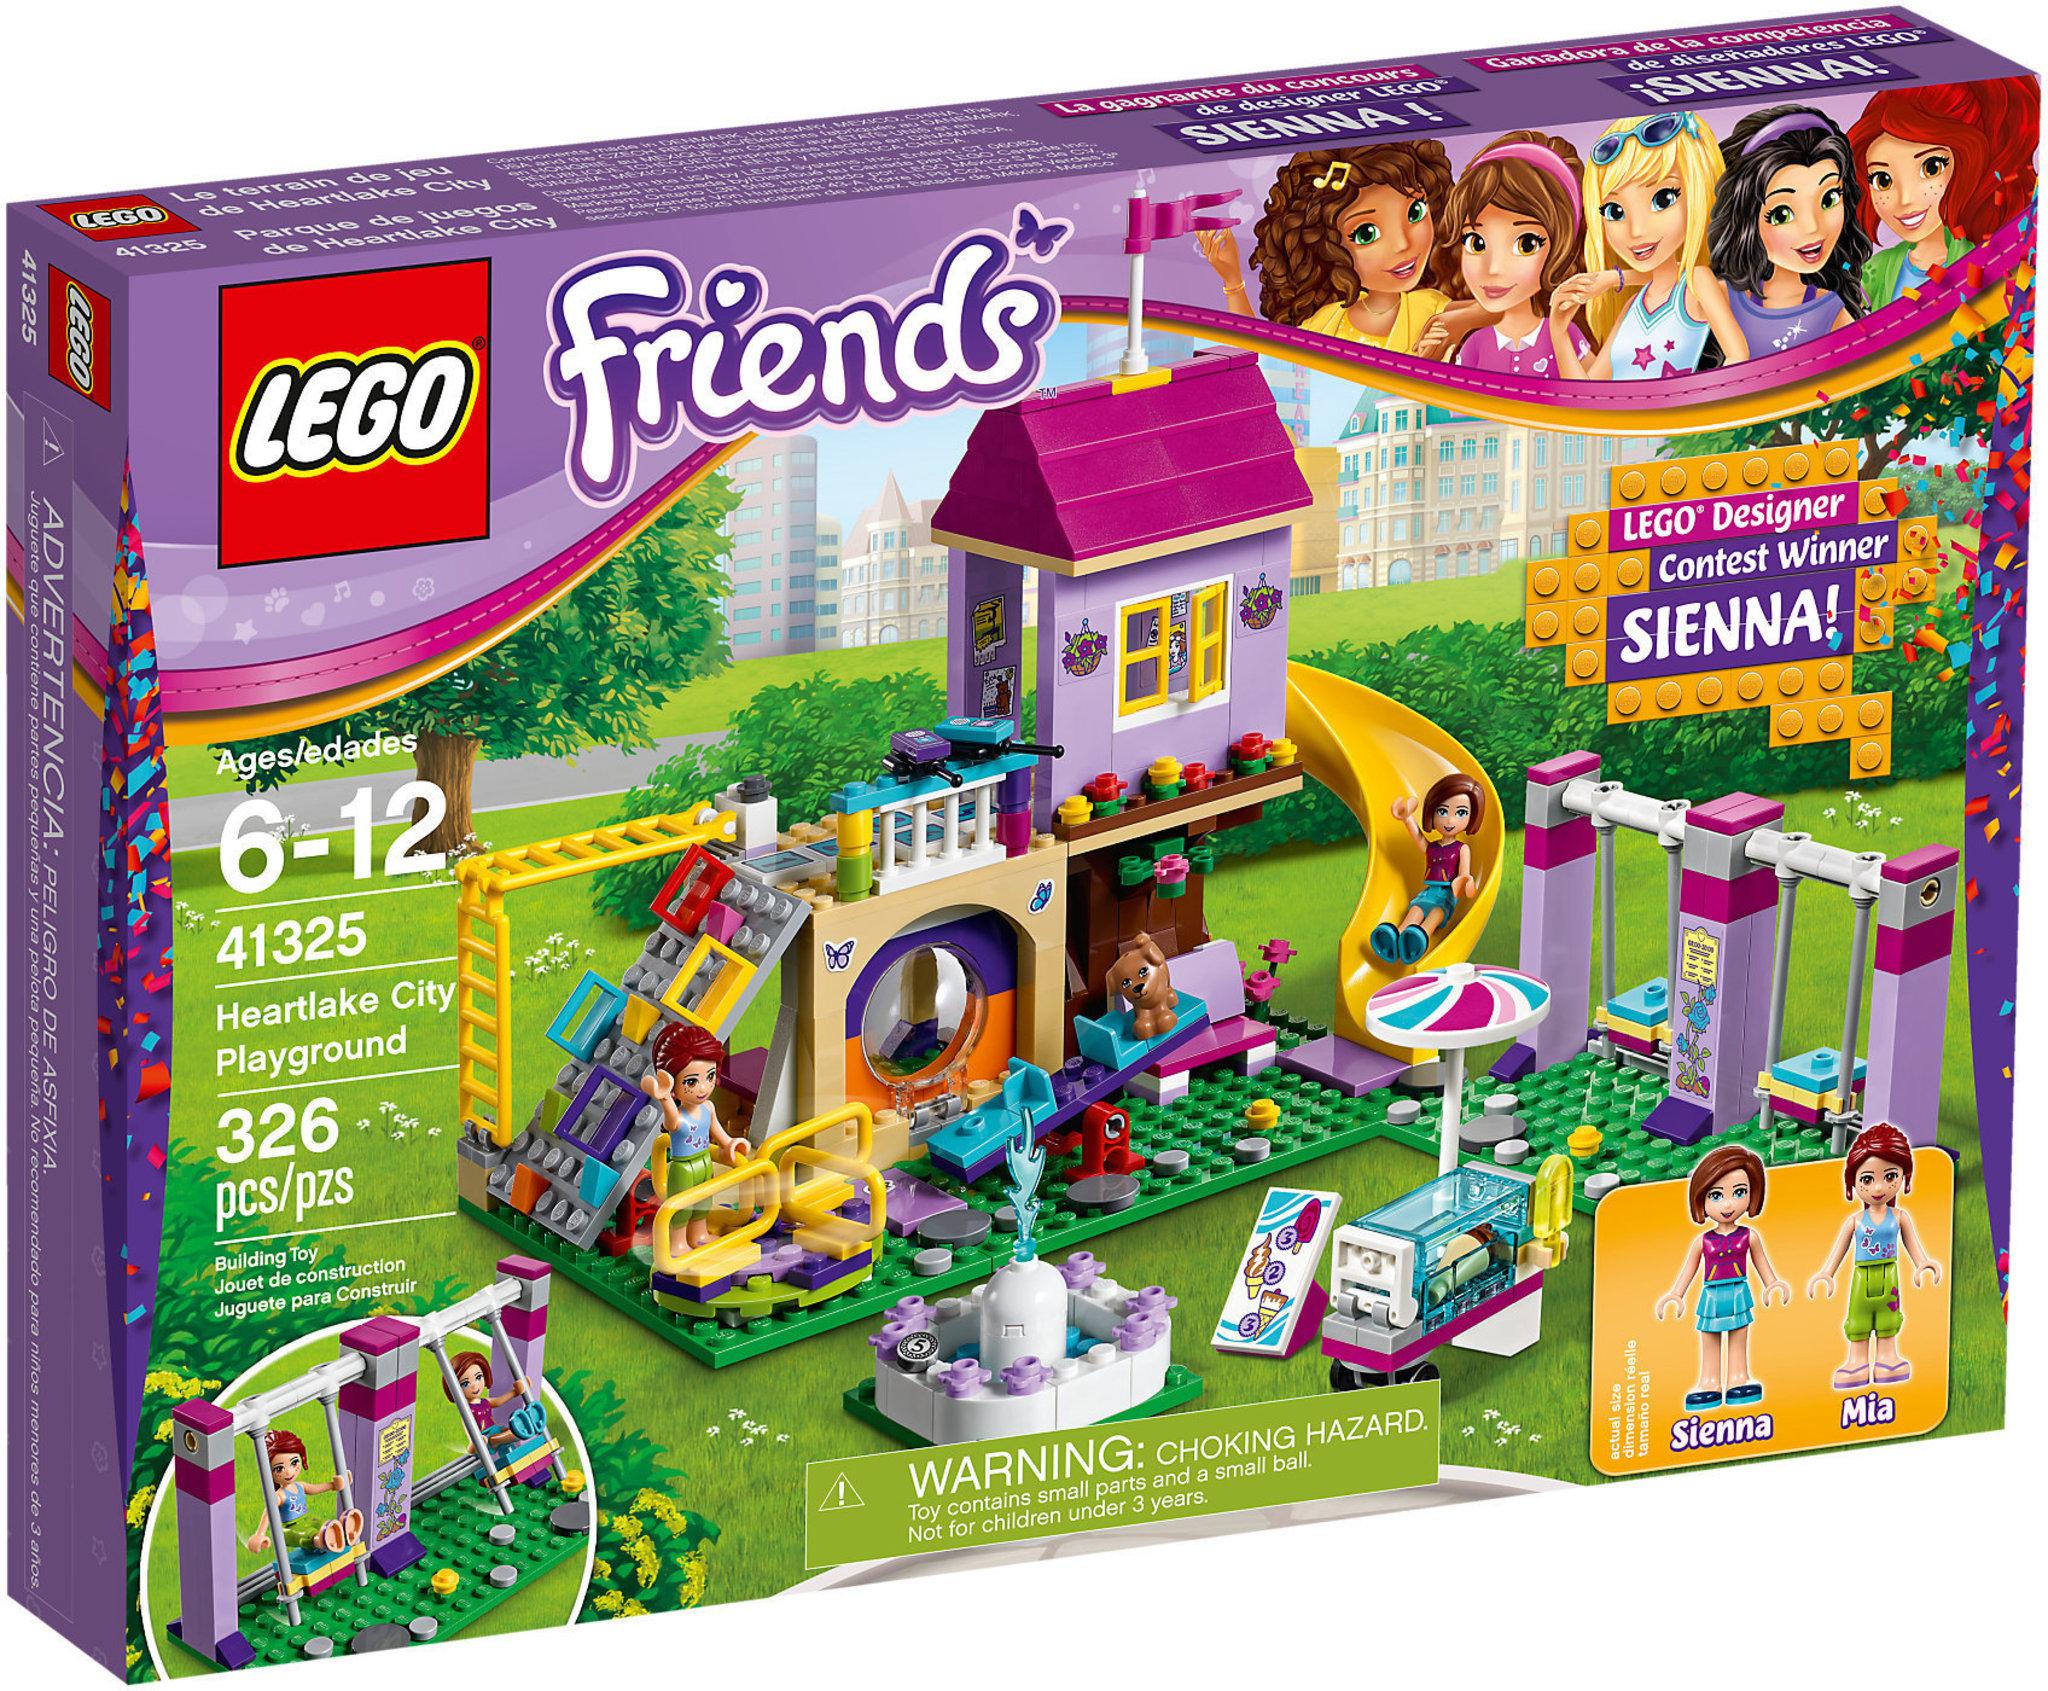 LEGO Friends 41325 - Heartlake City Playground